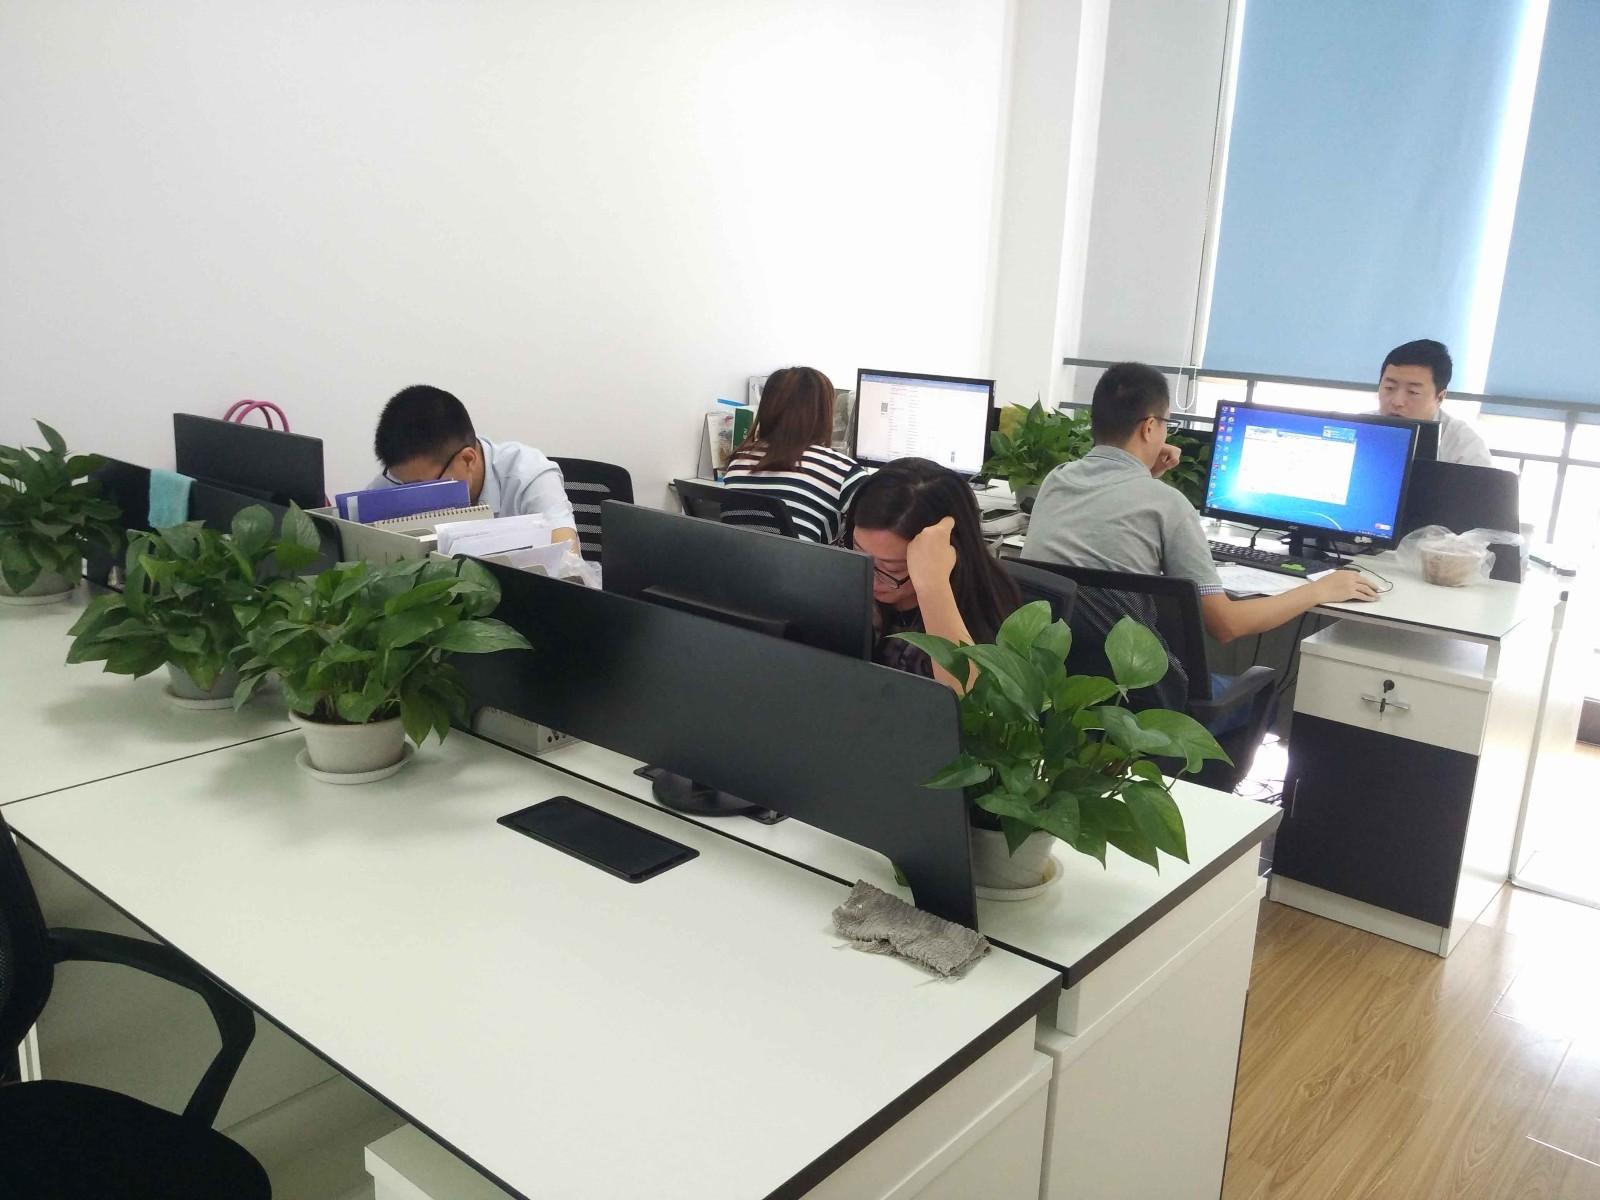 办公室 1600_1200